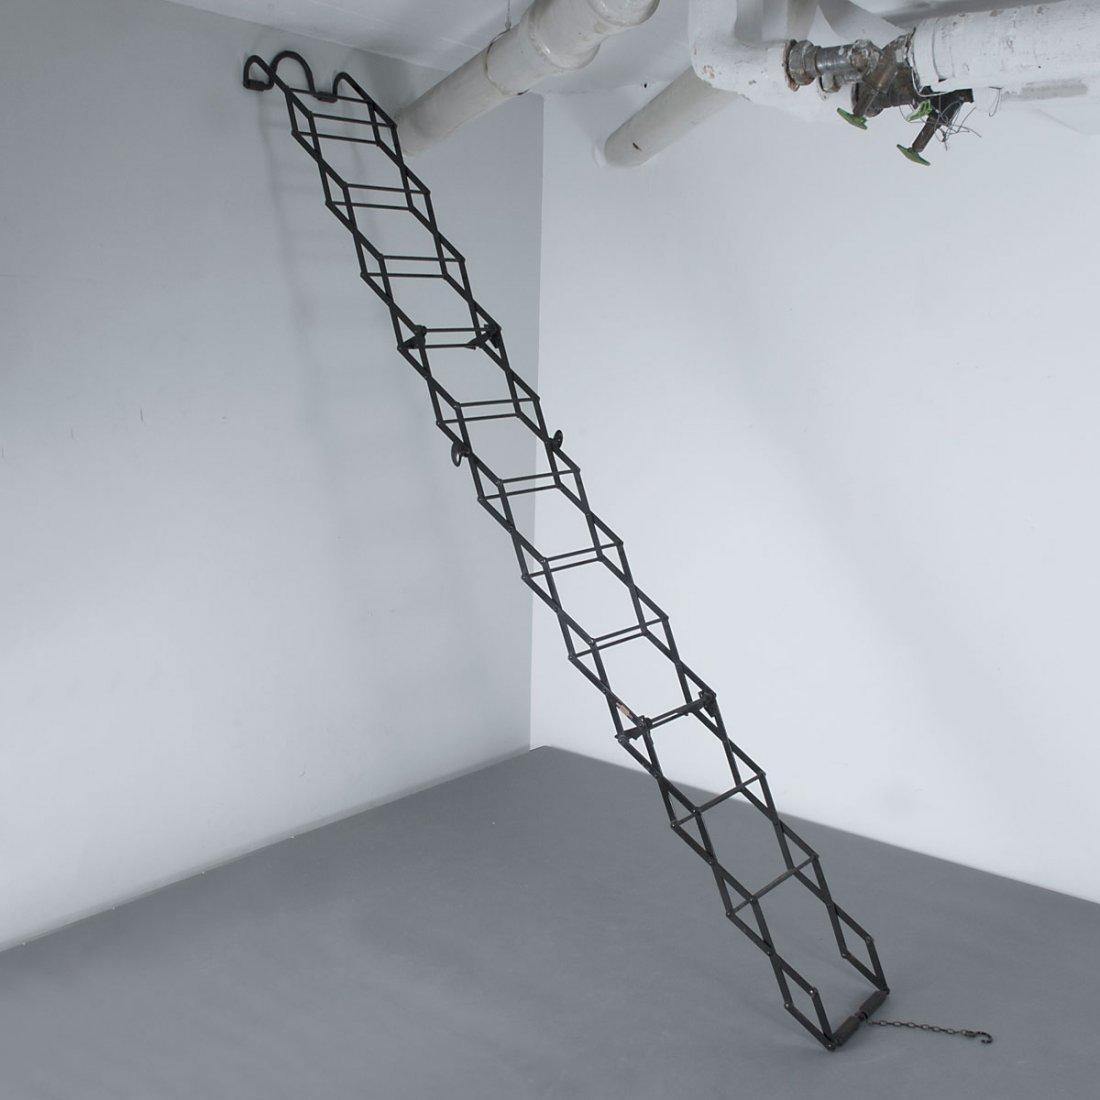 Gravity Ladders Ltd., London. Ladder, c1900. H. 28 x 38